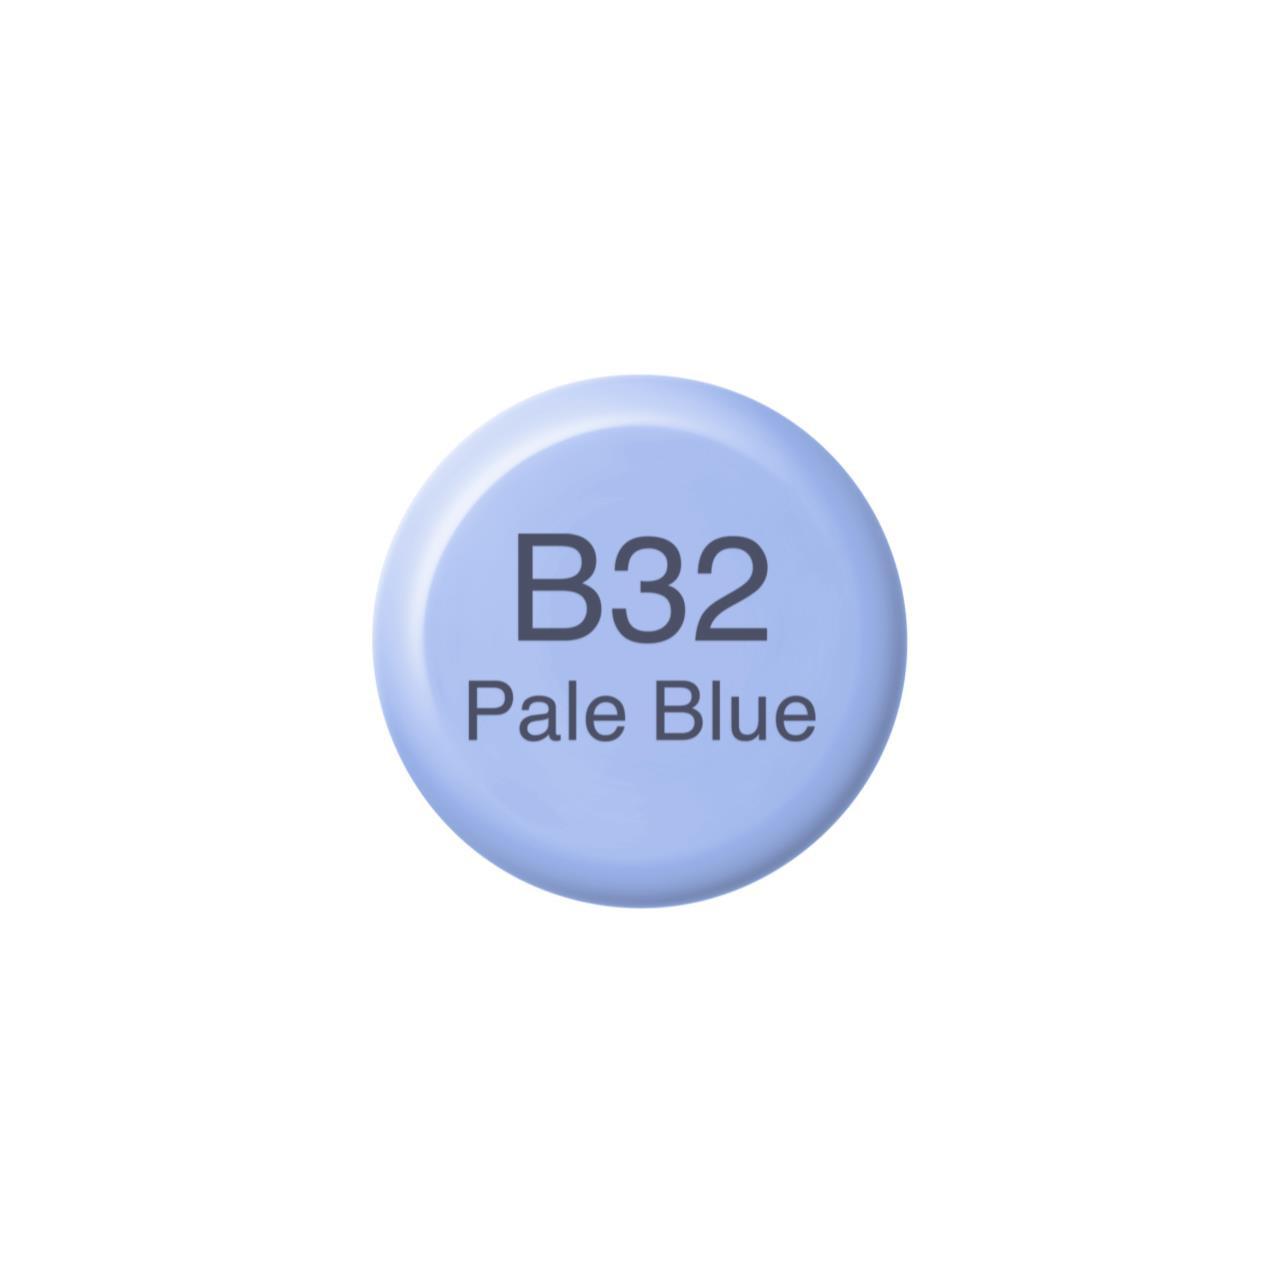 B32 Pale Blue, Copic Ink - 4511338055984